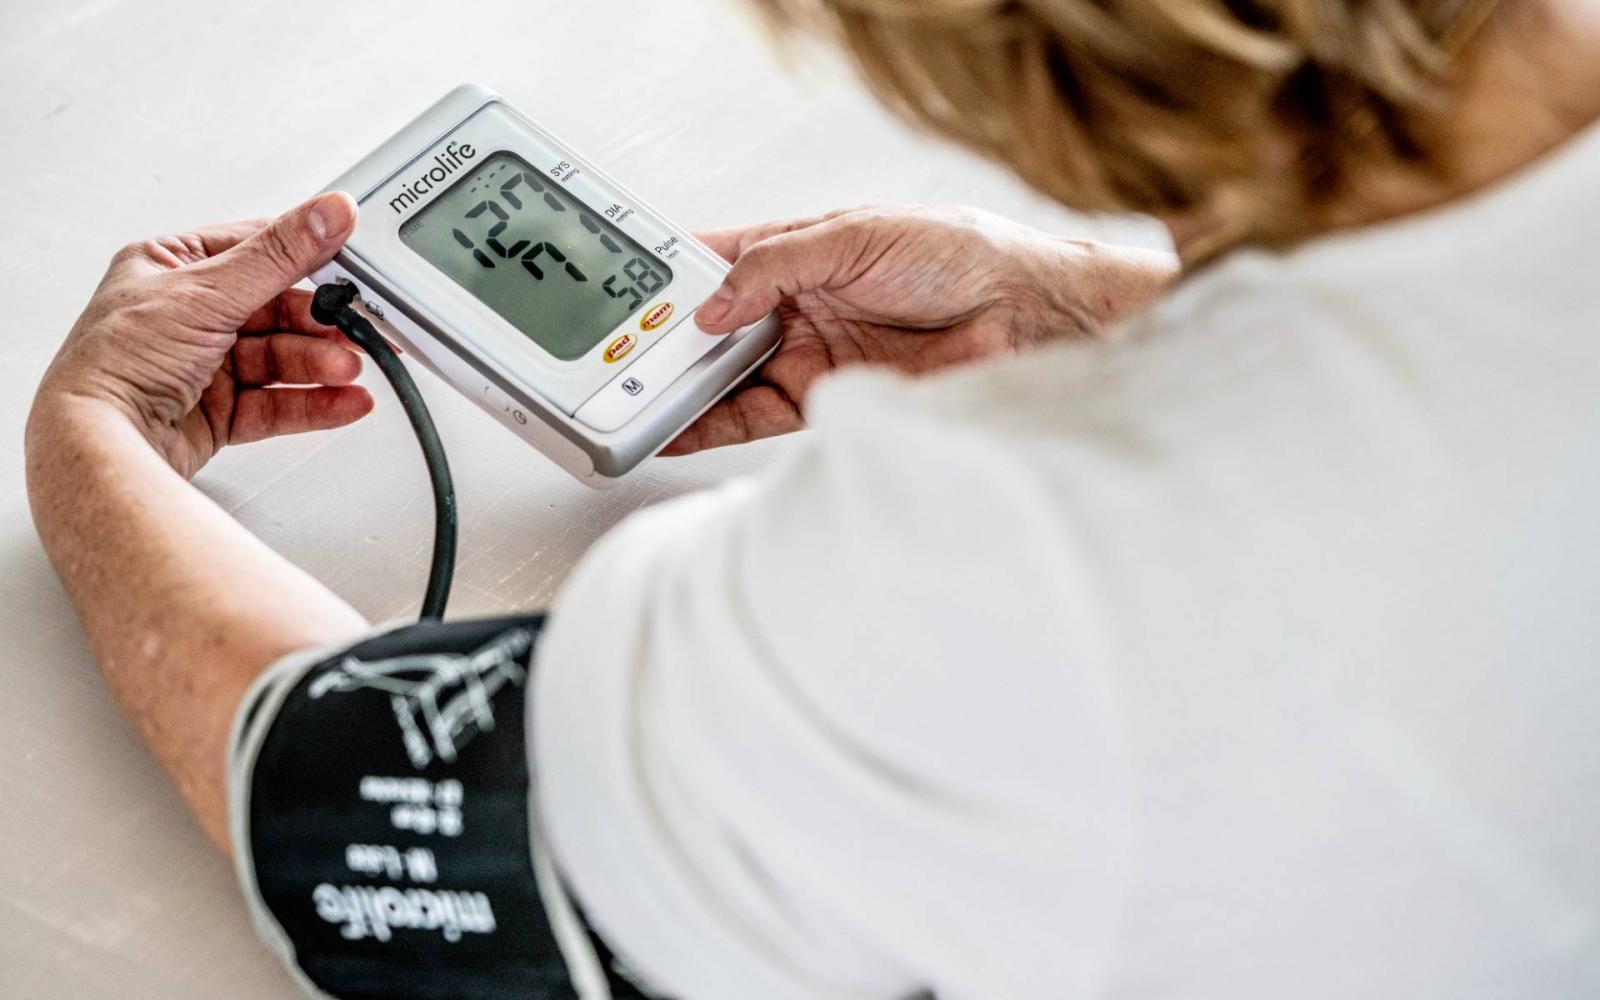 Fiatal-m.vérnyomás   nlc